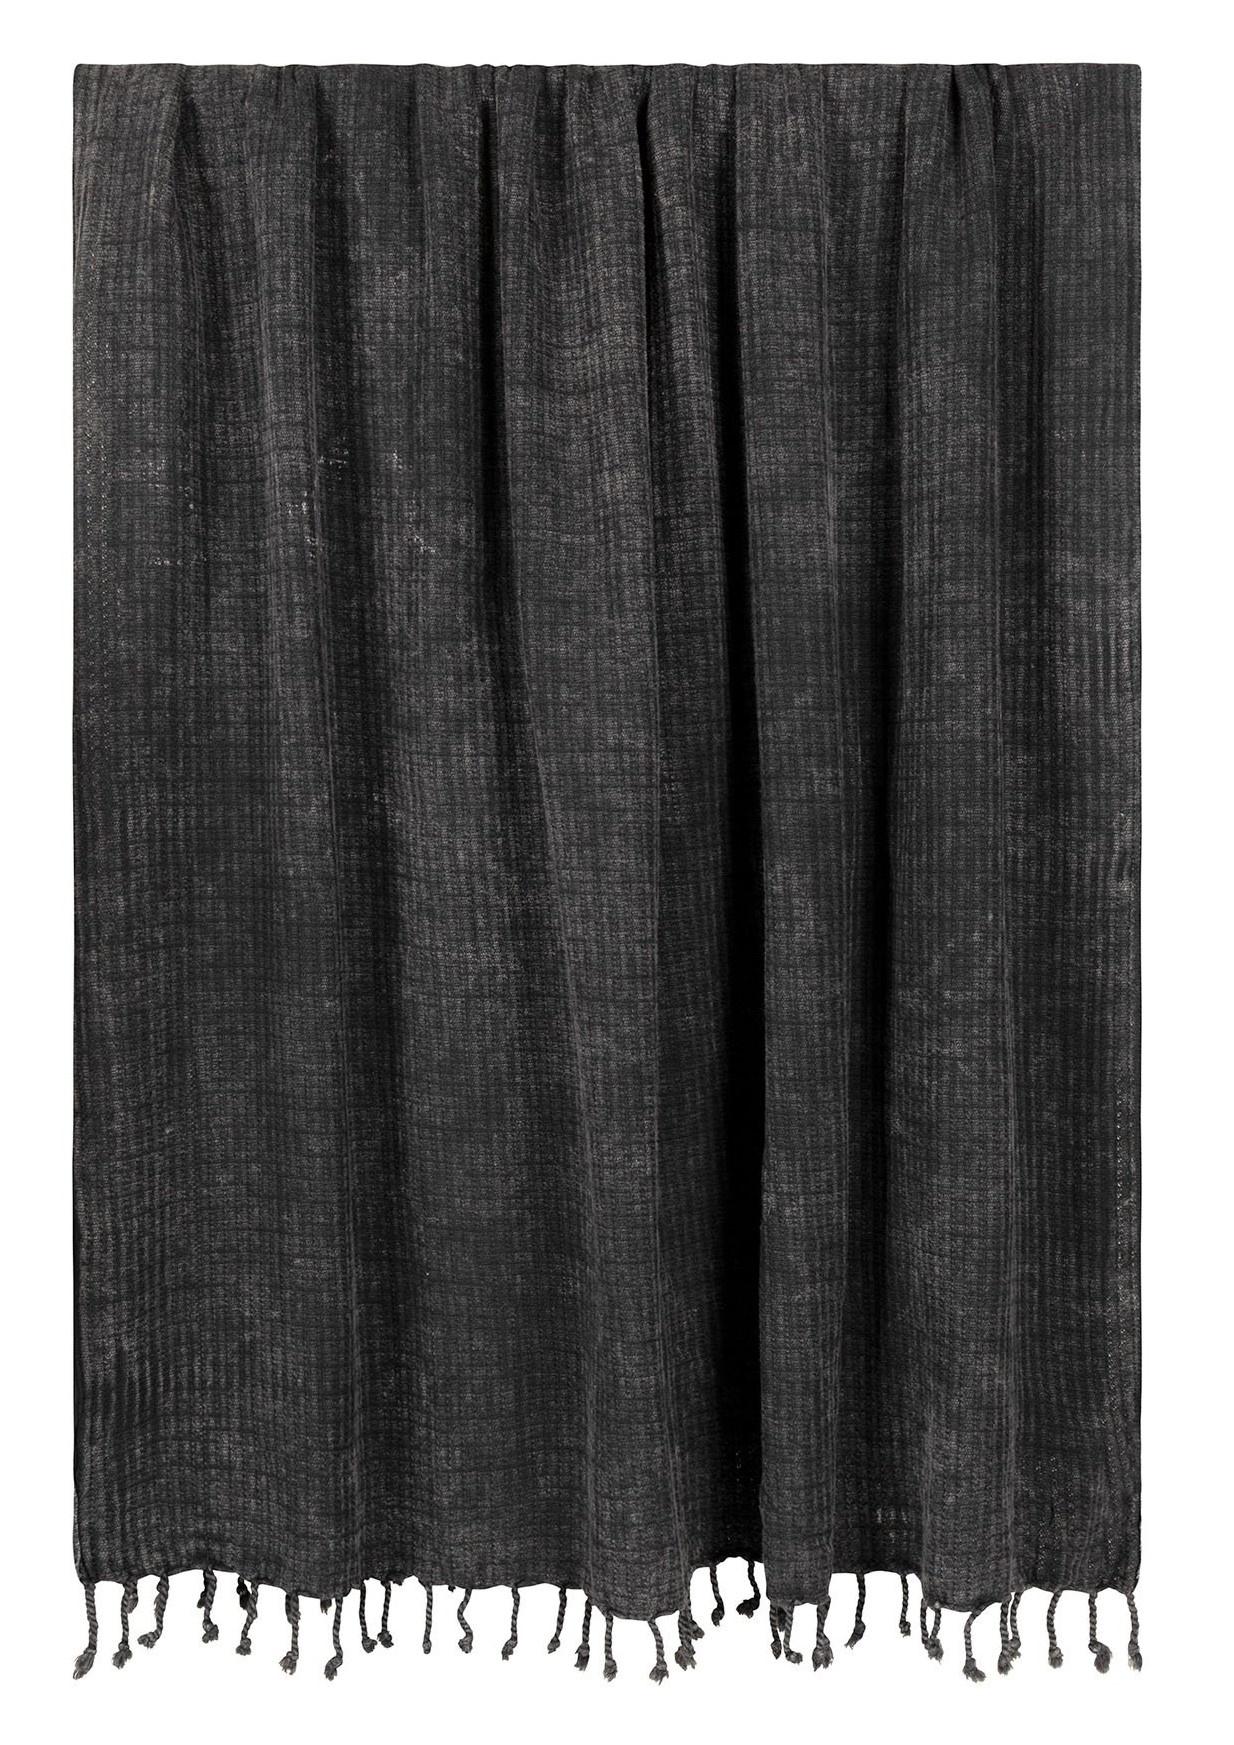 Handdoek hamam towel dark grey/blue-1